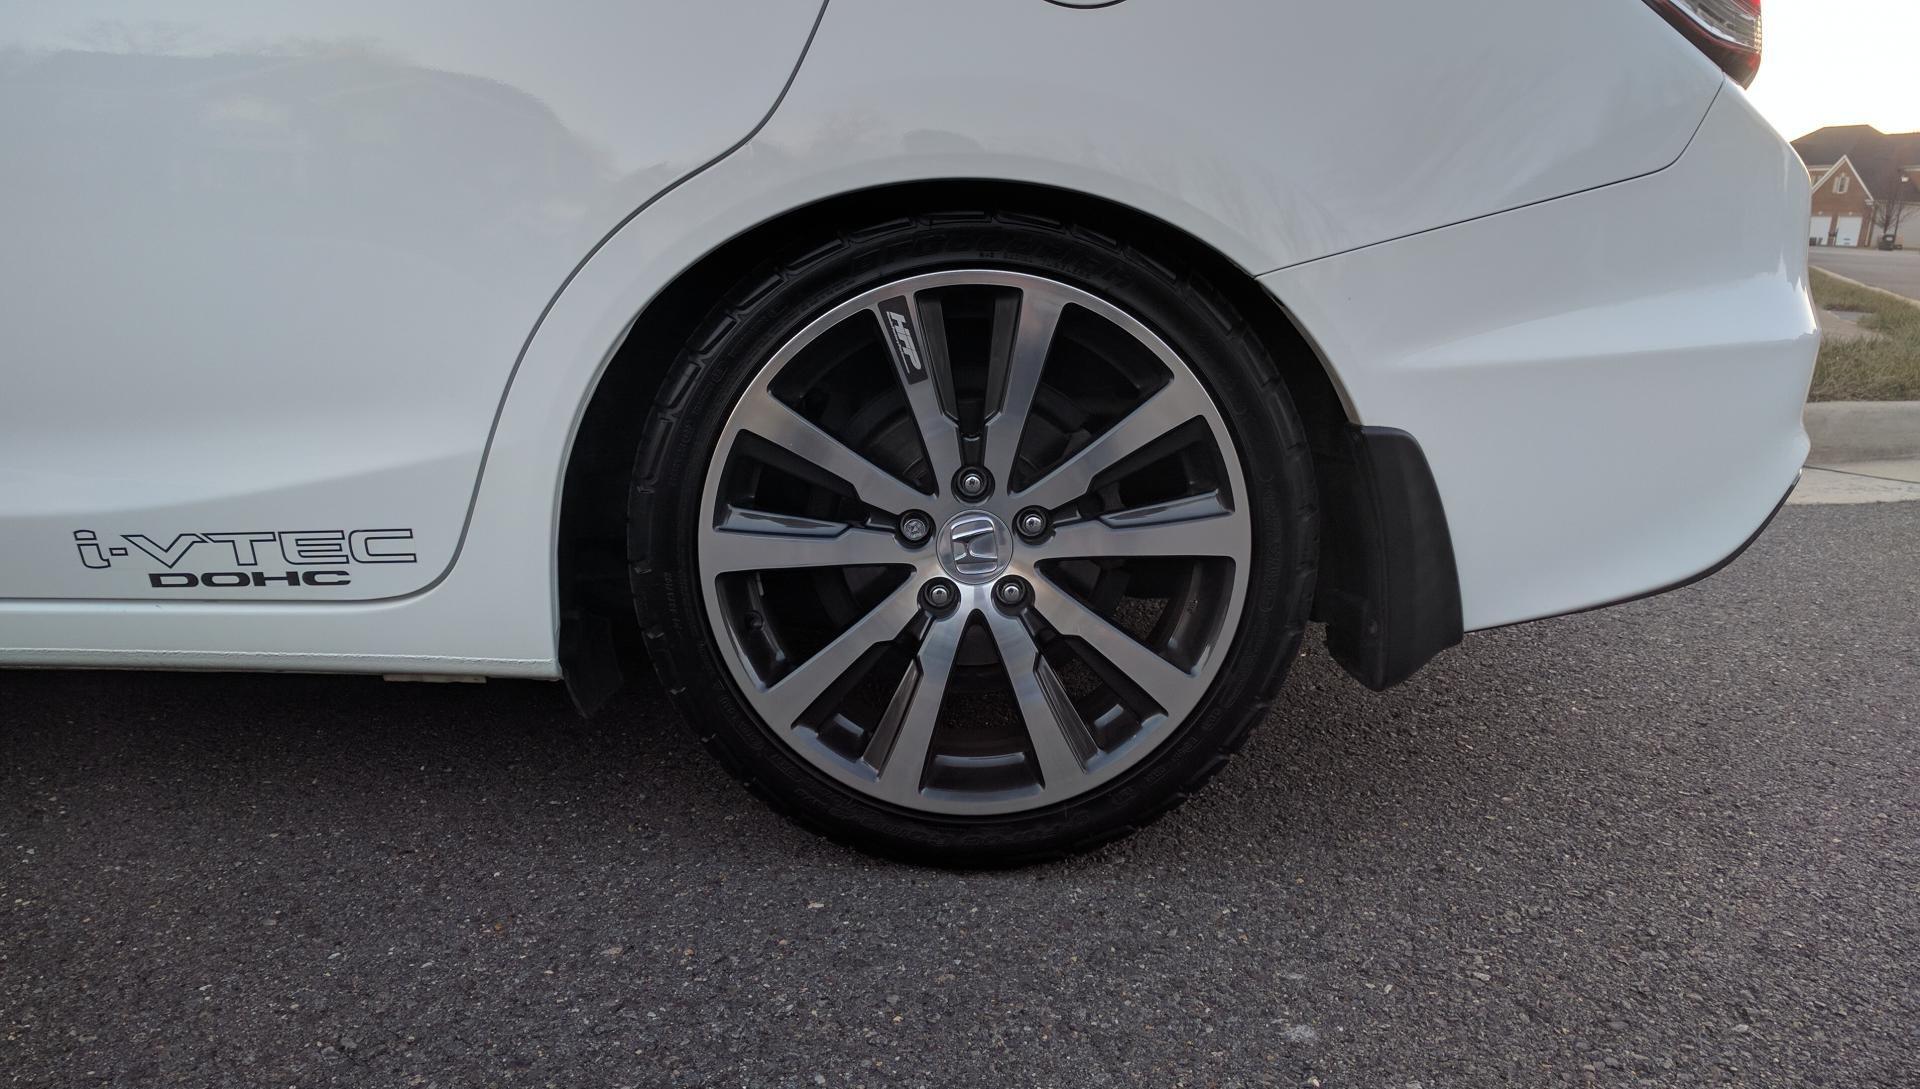 9th generation oem wheel thread oem wheels only please img_20161220_163949 jpg